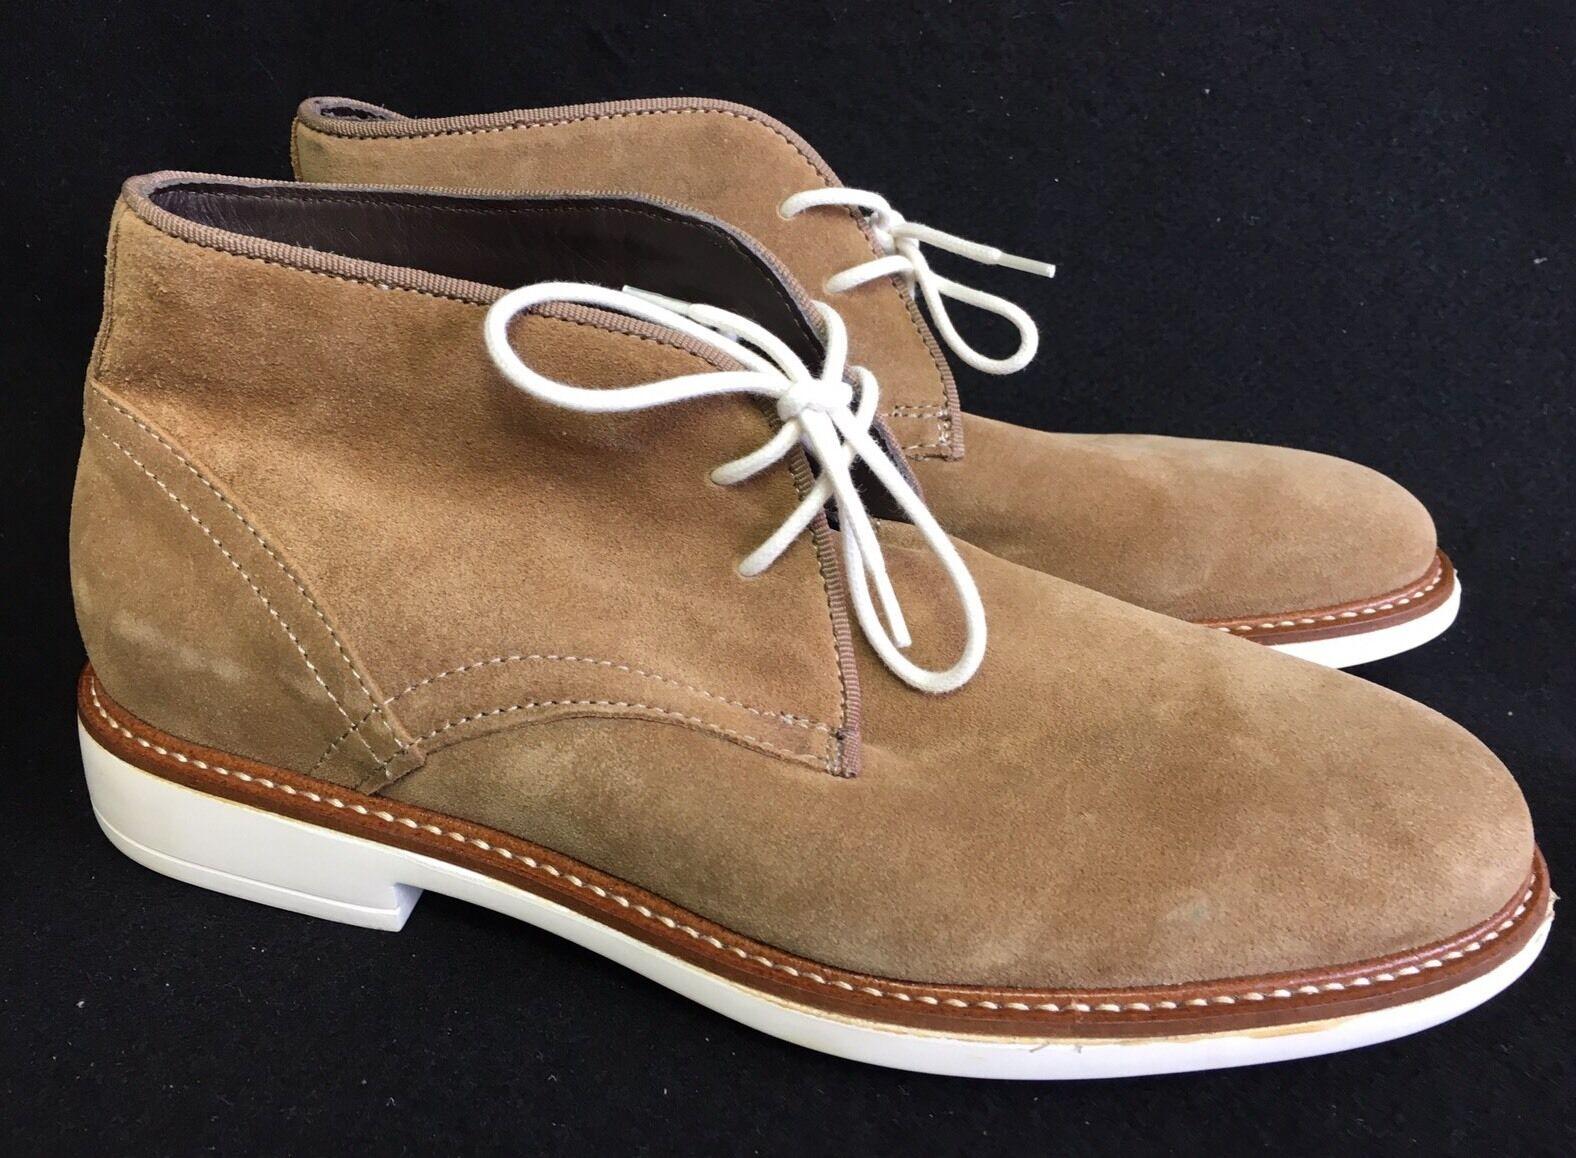 Wallin & Bros Roseto MSRoseto Chukka Suede Ankle Boot size 40 / 7 M US Chestnut